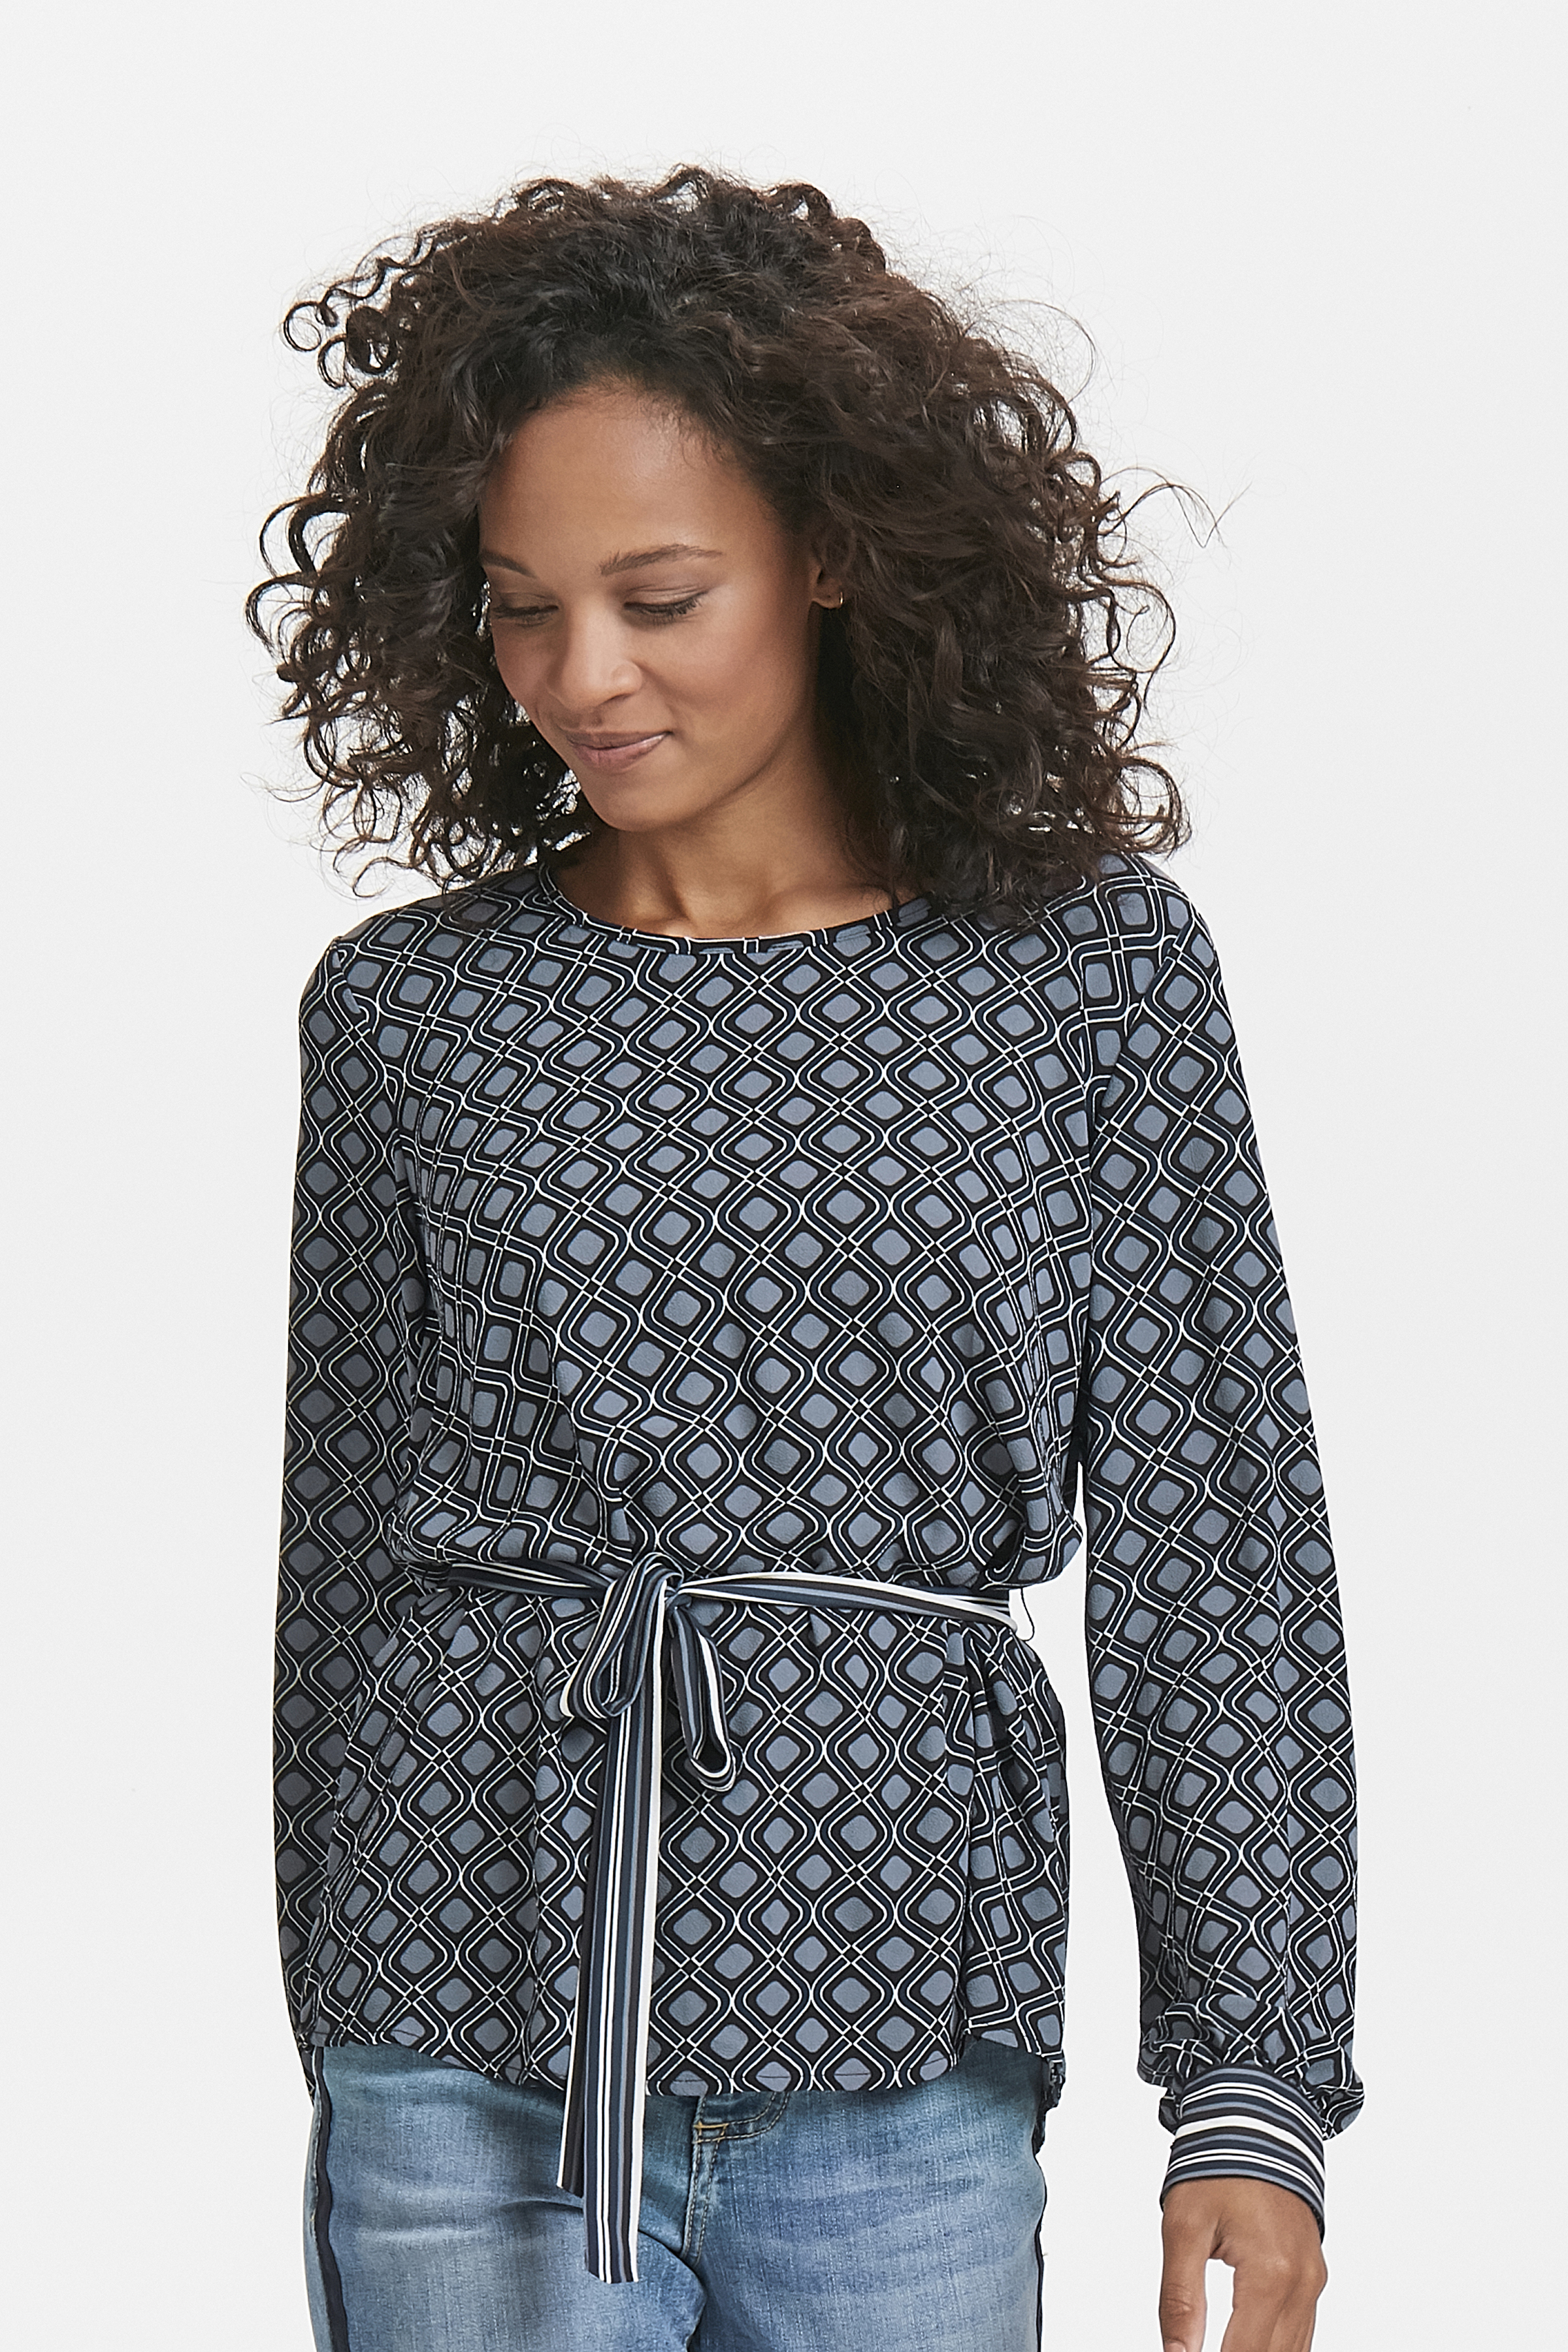 Grau/schwarz Langarm-Bluse  von Kaffe – Shoppen SieGrau/schwarz Langarm-Bluse  ab Gr. 34-46 hier